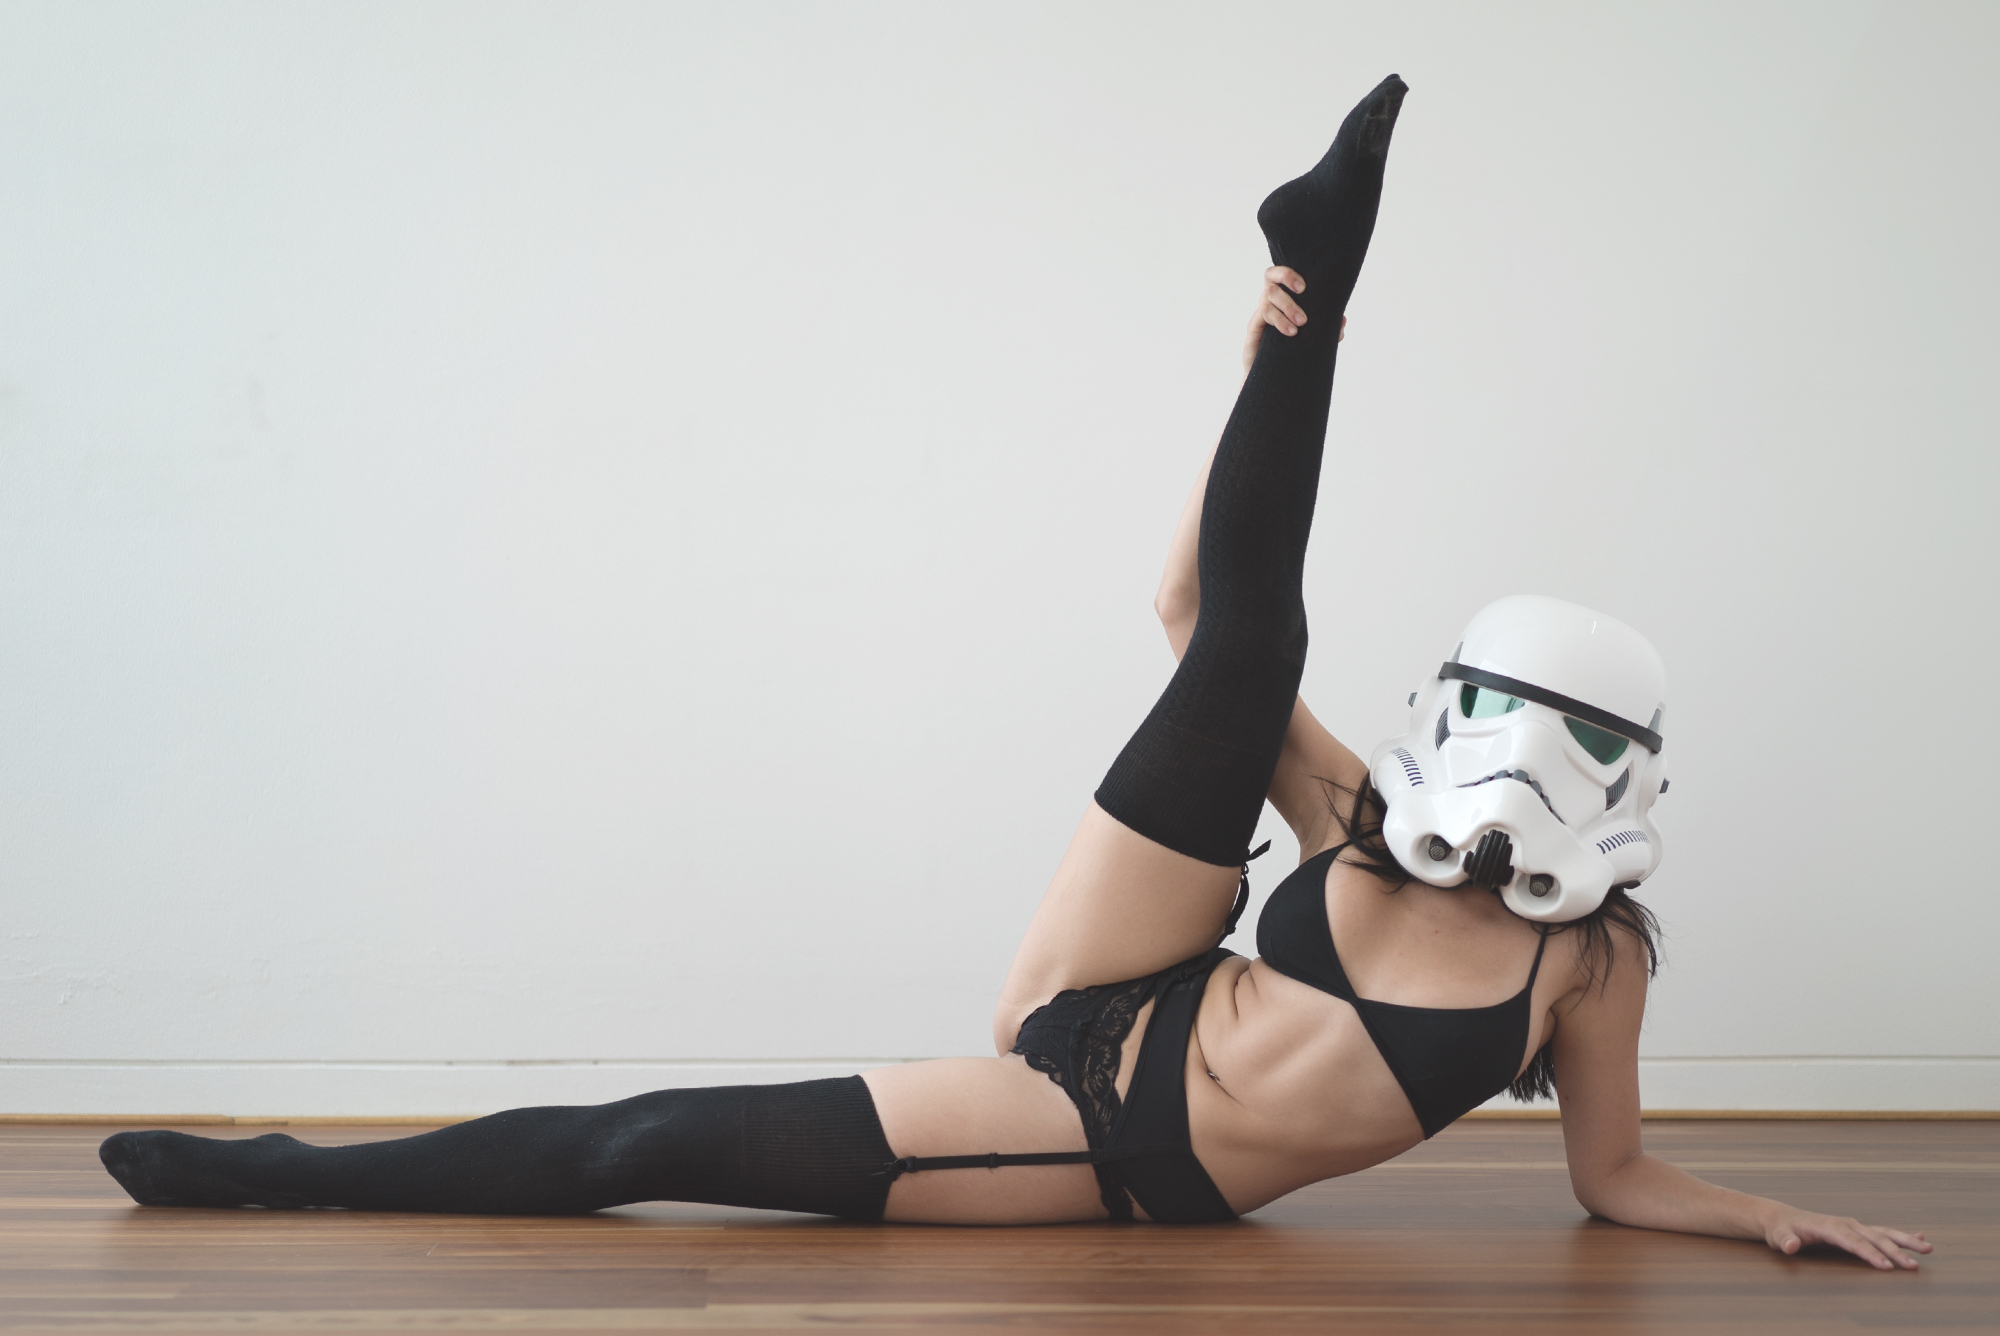 rochelle_stormtrooper_5